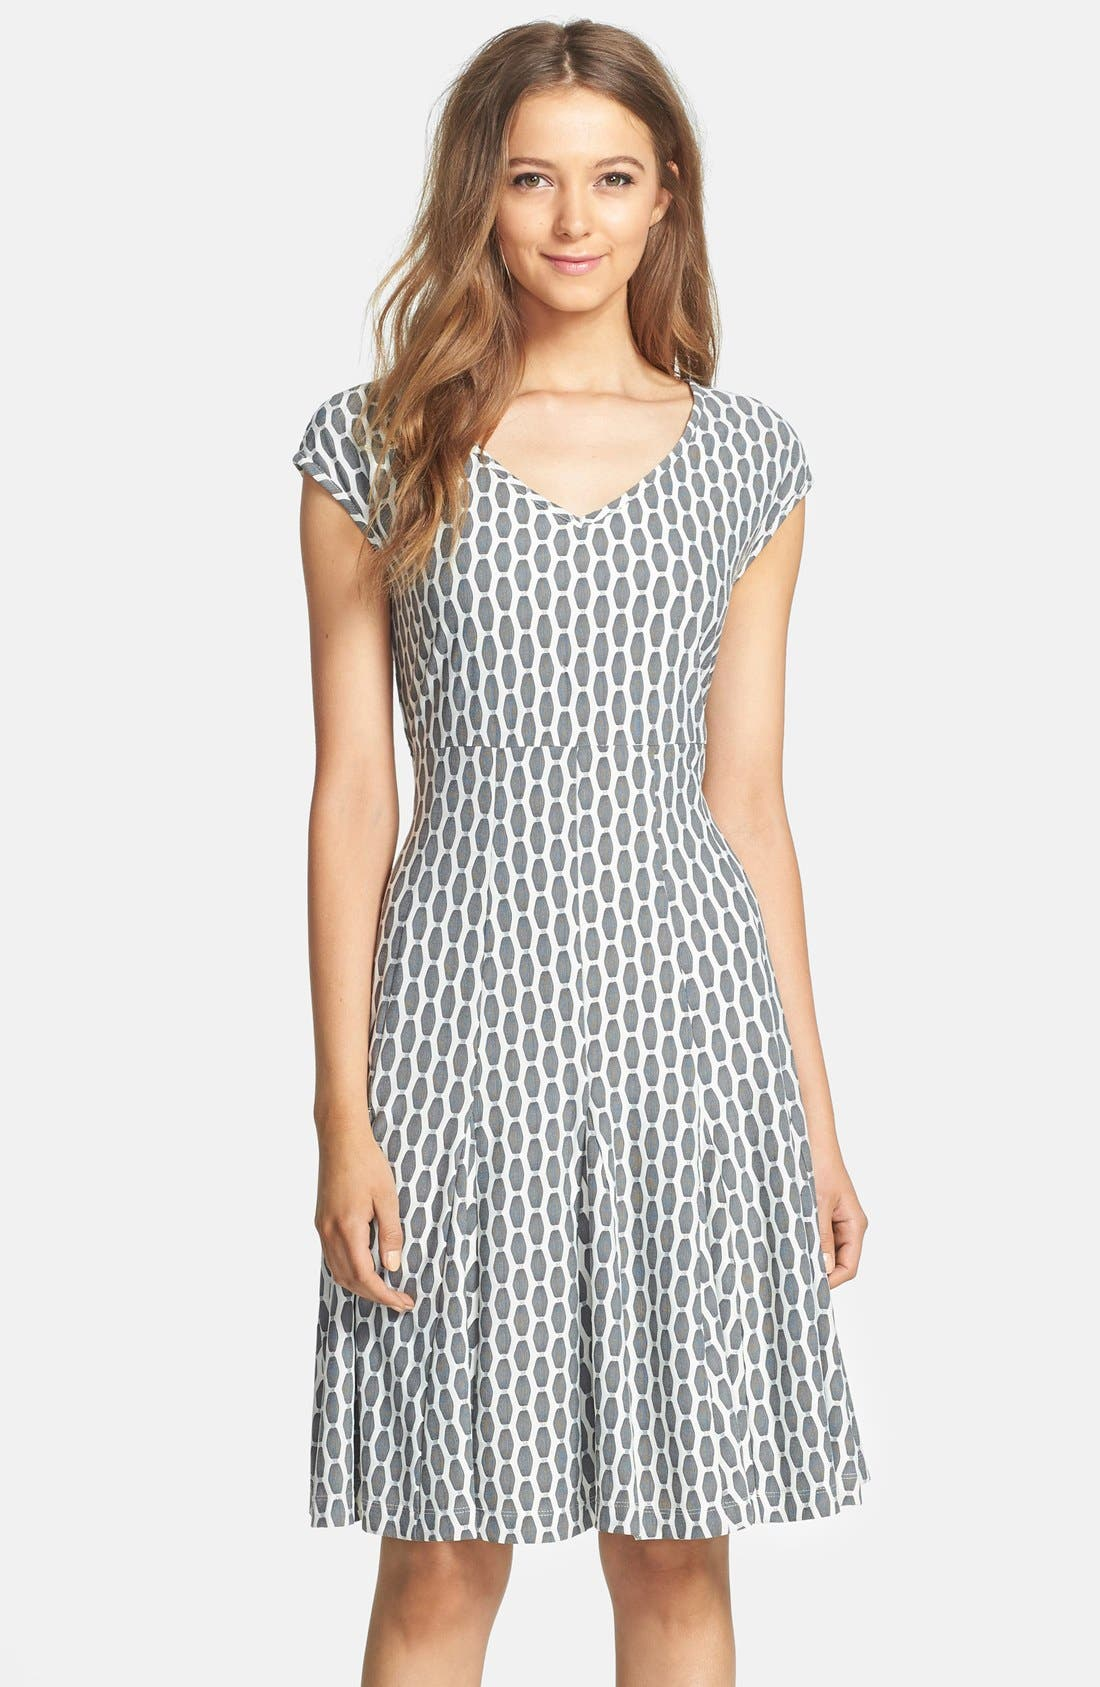 Alternate Image 1 Selected - Taylor Dresses Knit A-Line Dress